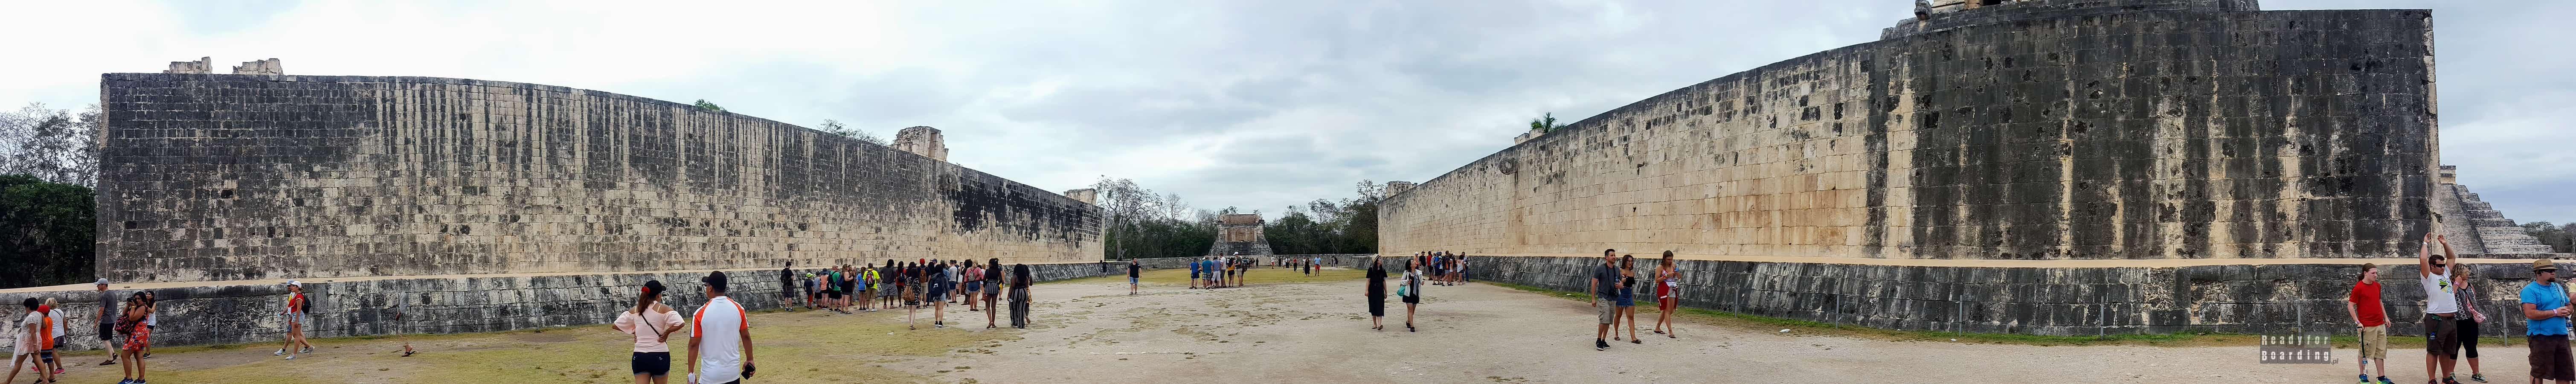 Panorama: Gran Juego de Pelota, Chichén Itzá – Meksyk